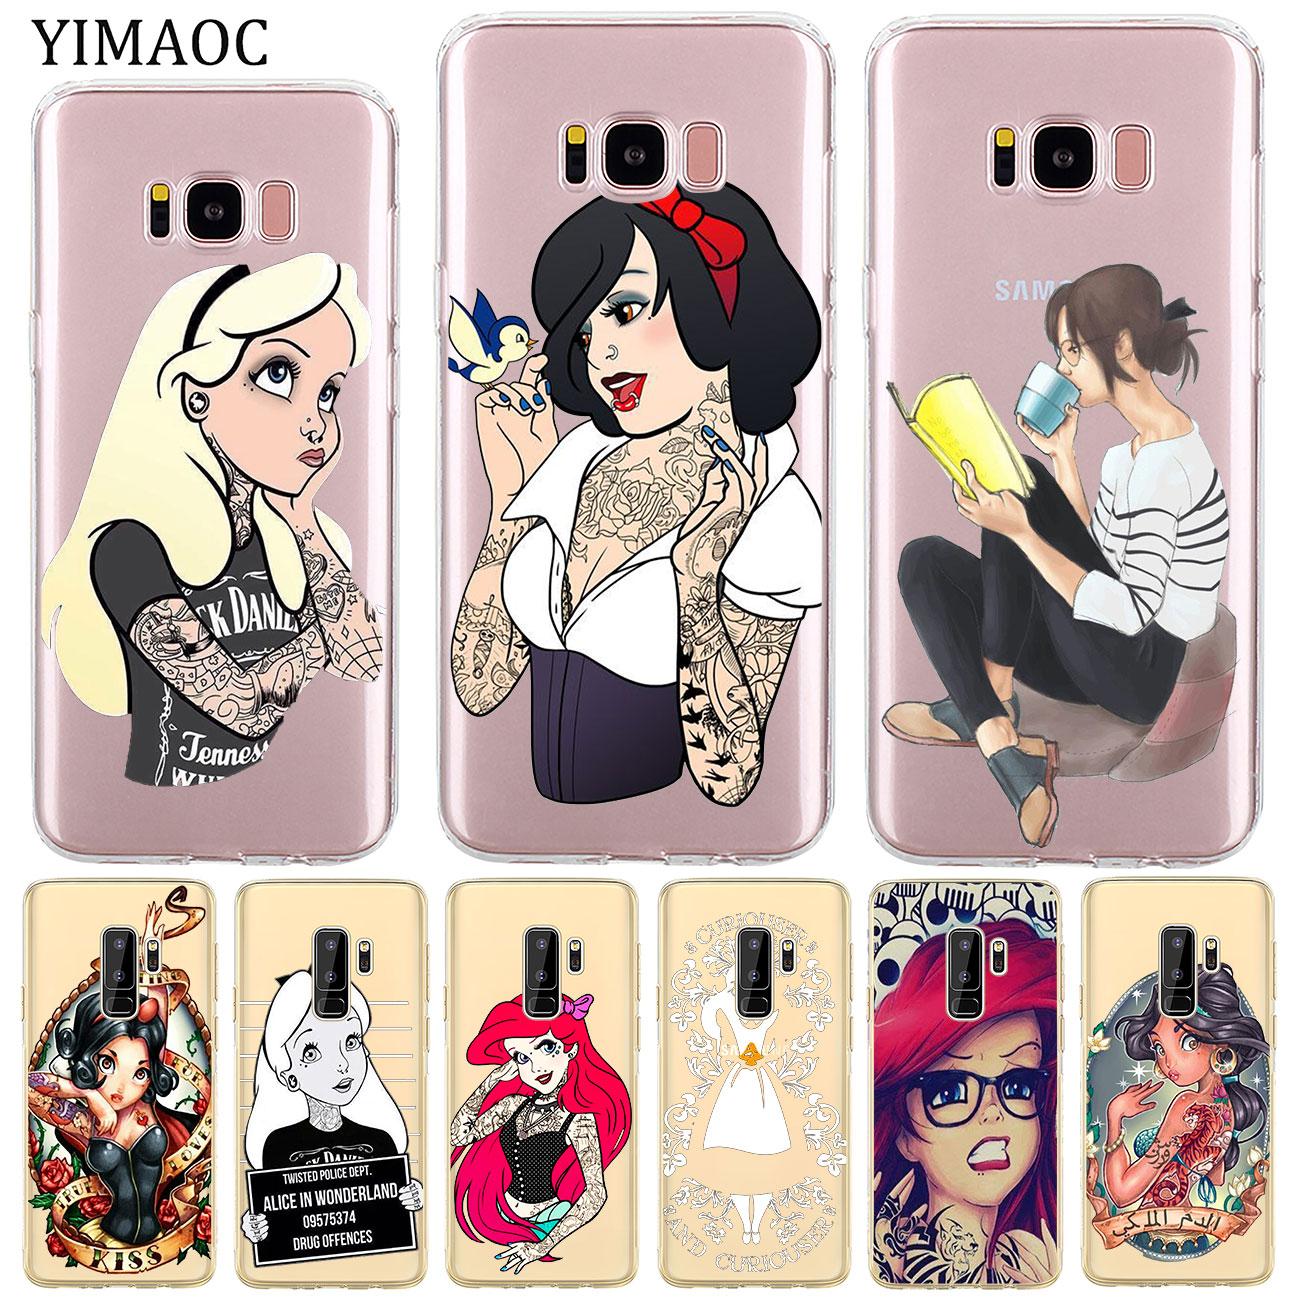 Ana Bekoa Wikipedia ̿̿̿(•̪ ) online wholesale tattoo jasmin phone case and get